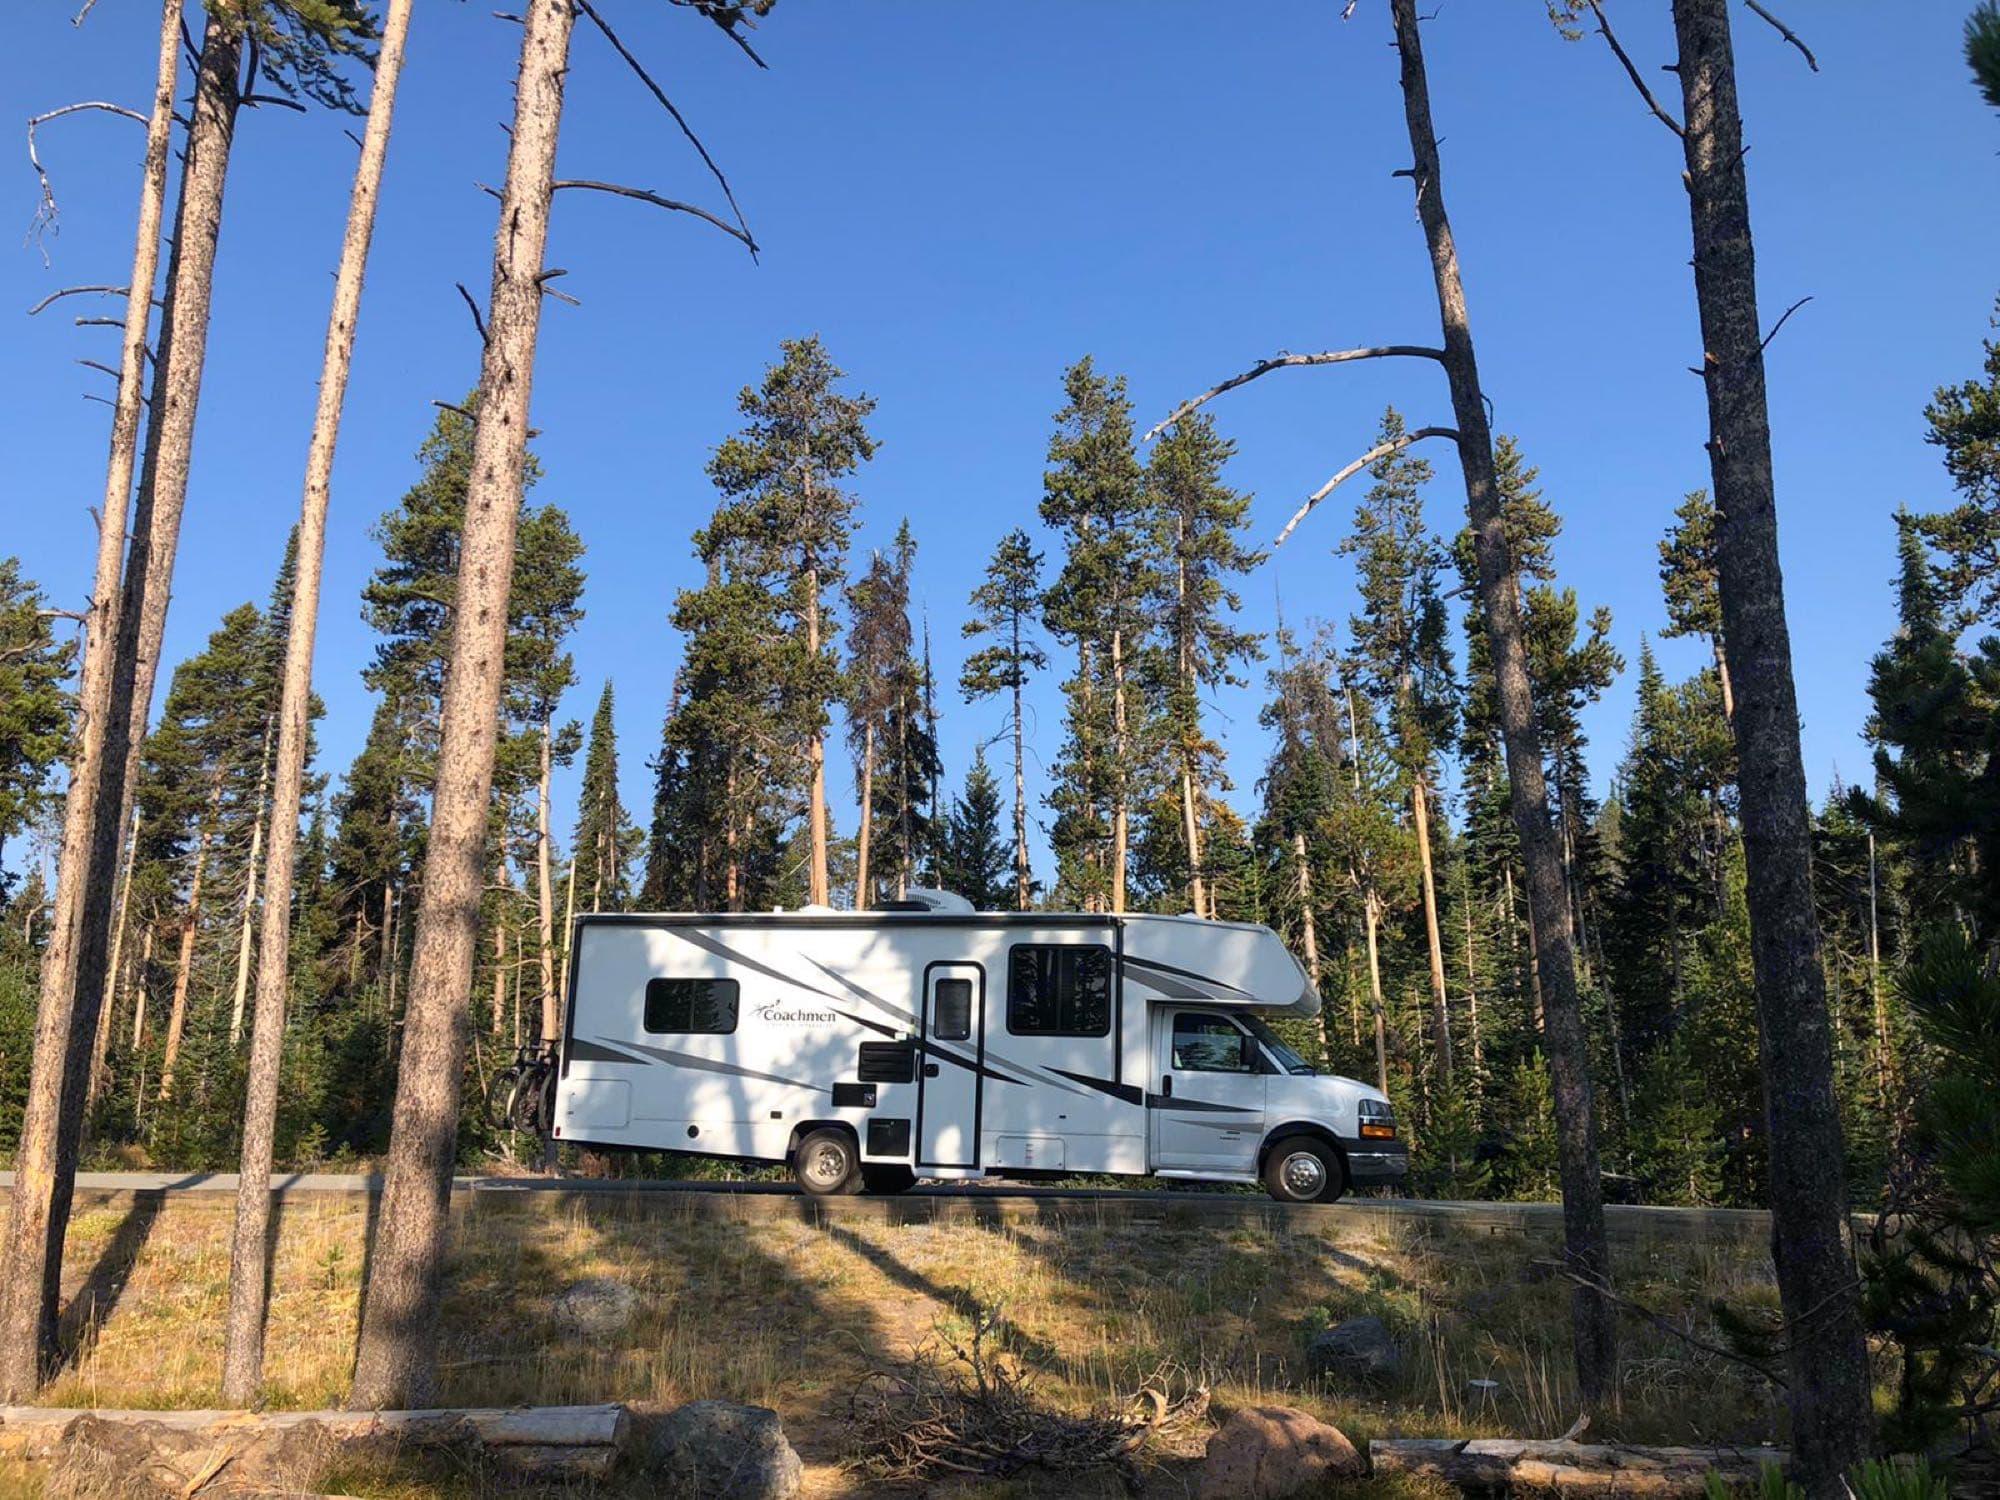 Our Glam Camp at work.. Chevrolet Freelander Coachmen 2020